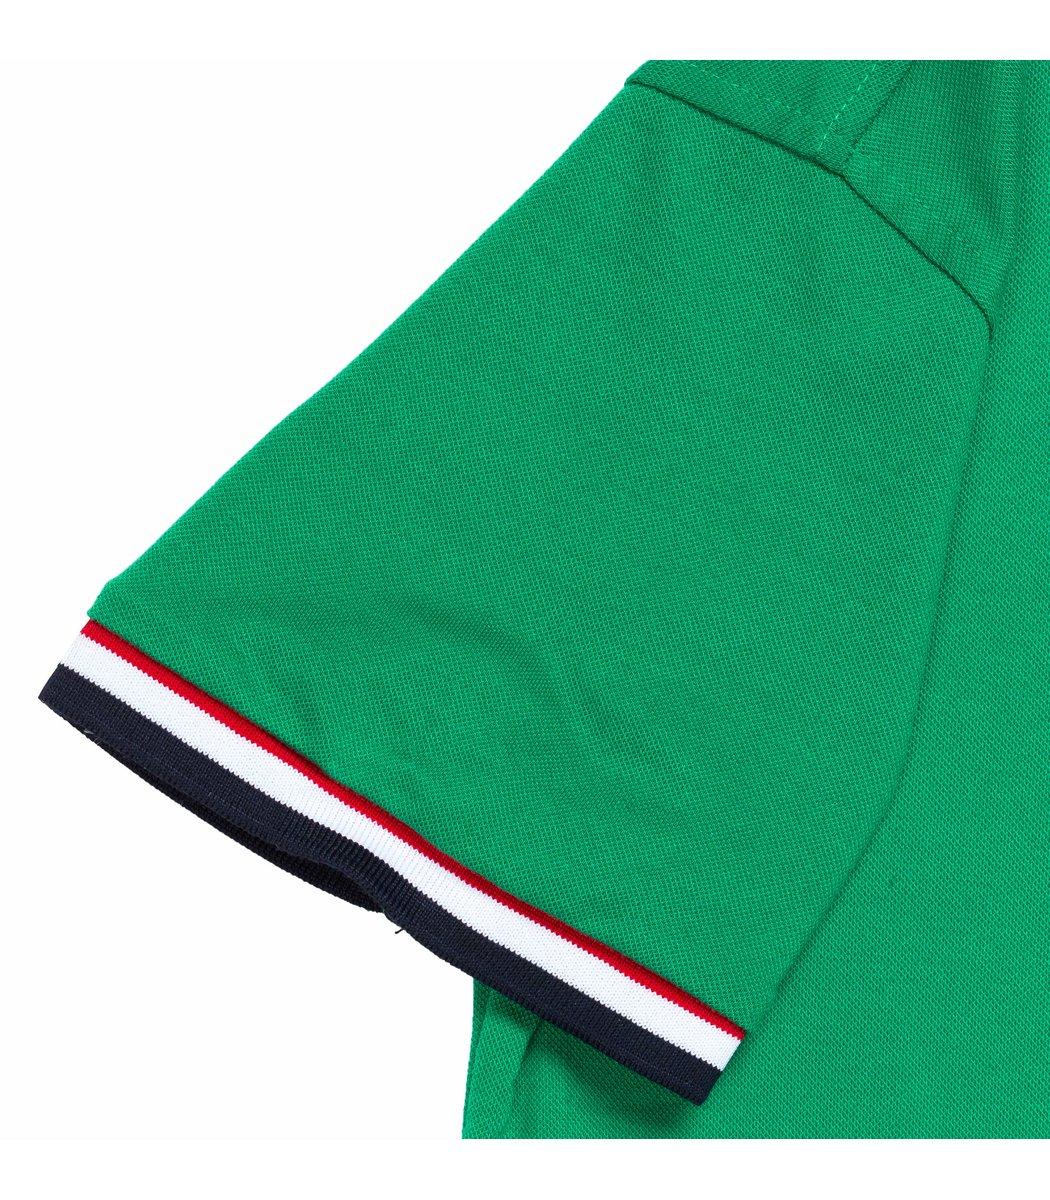 Мужская зеленая футболка поло Tommy Hilfige - зеленый - Вид 5